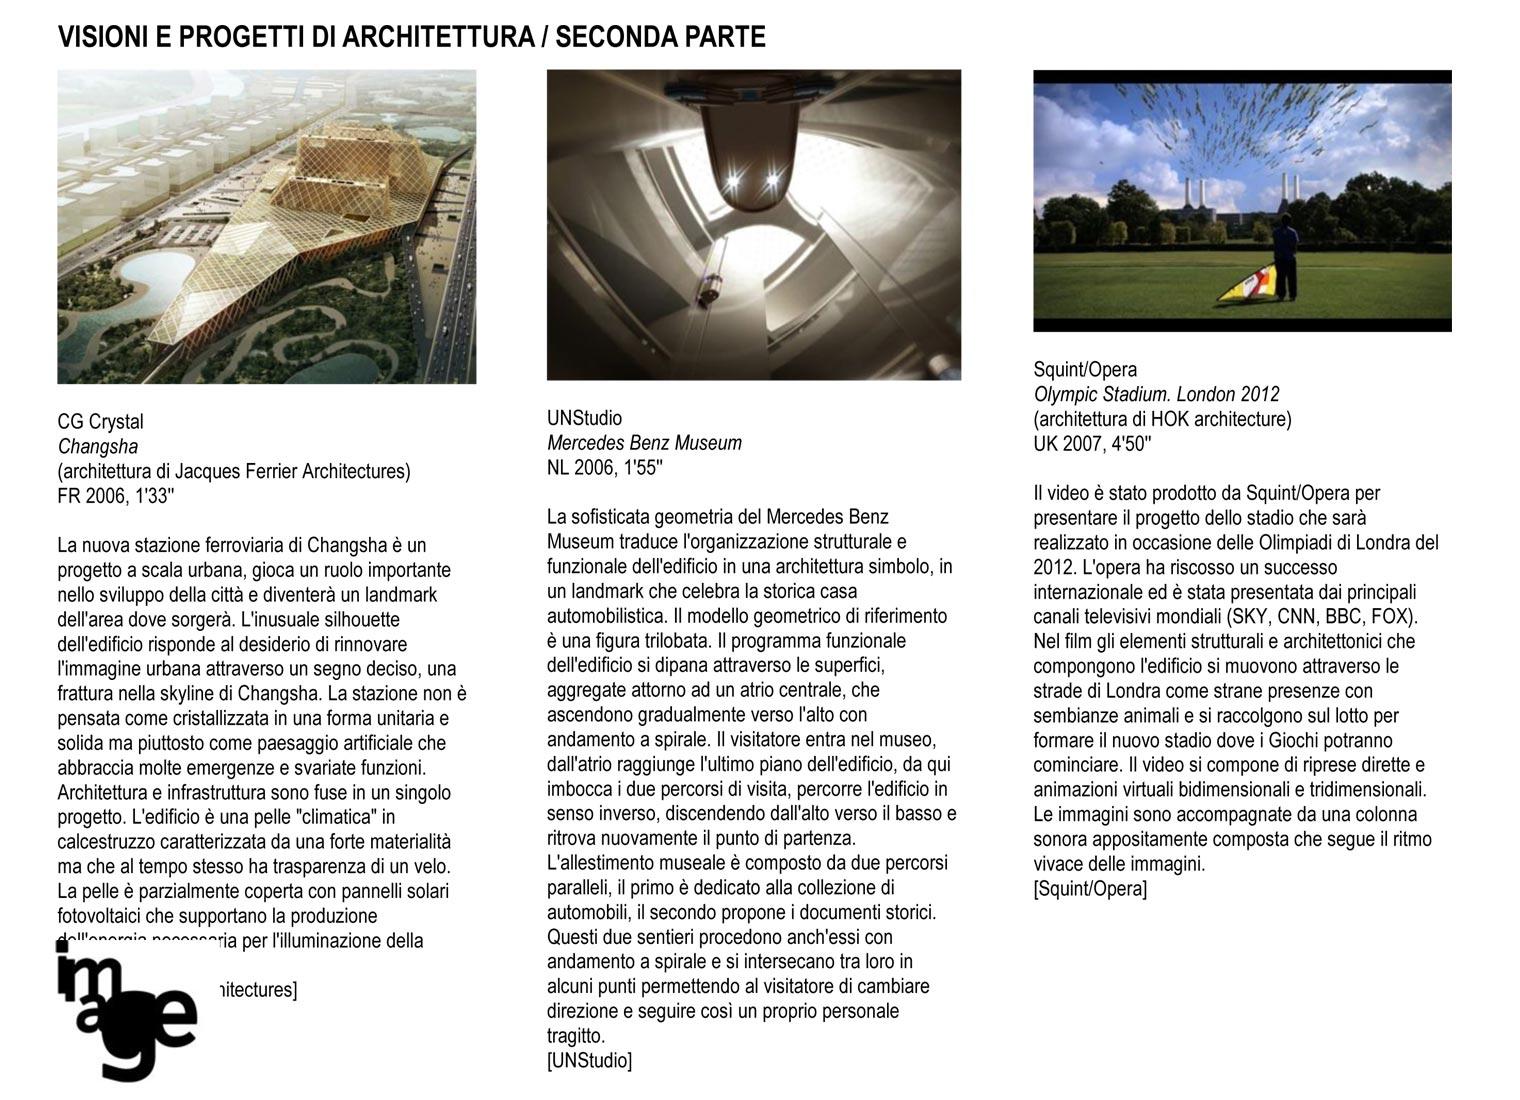 vk-architetti_archindoc_31